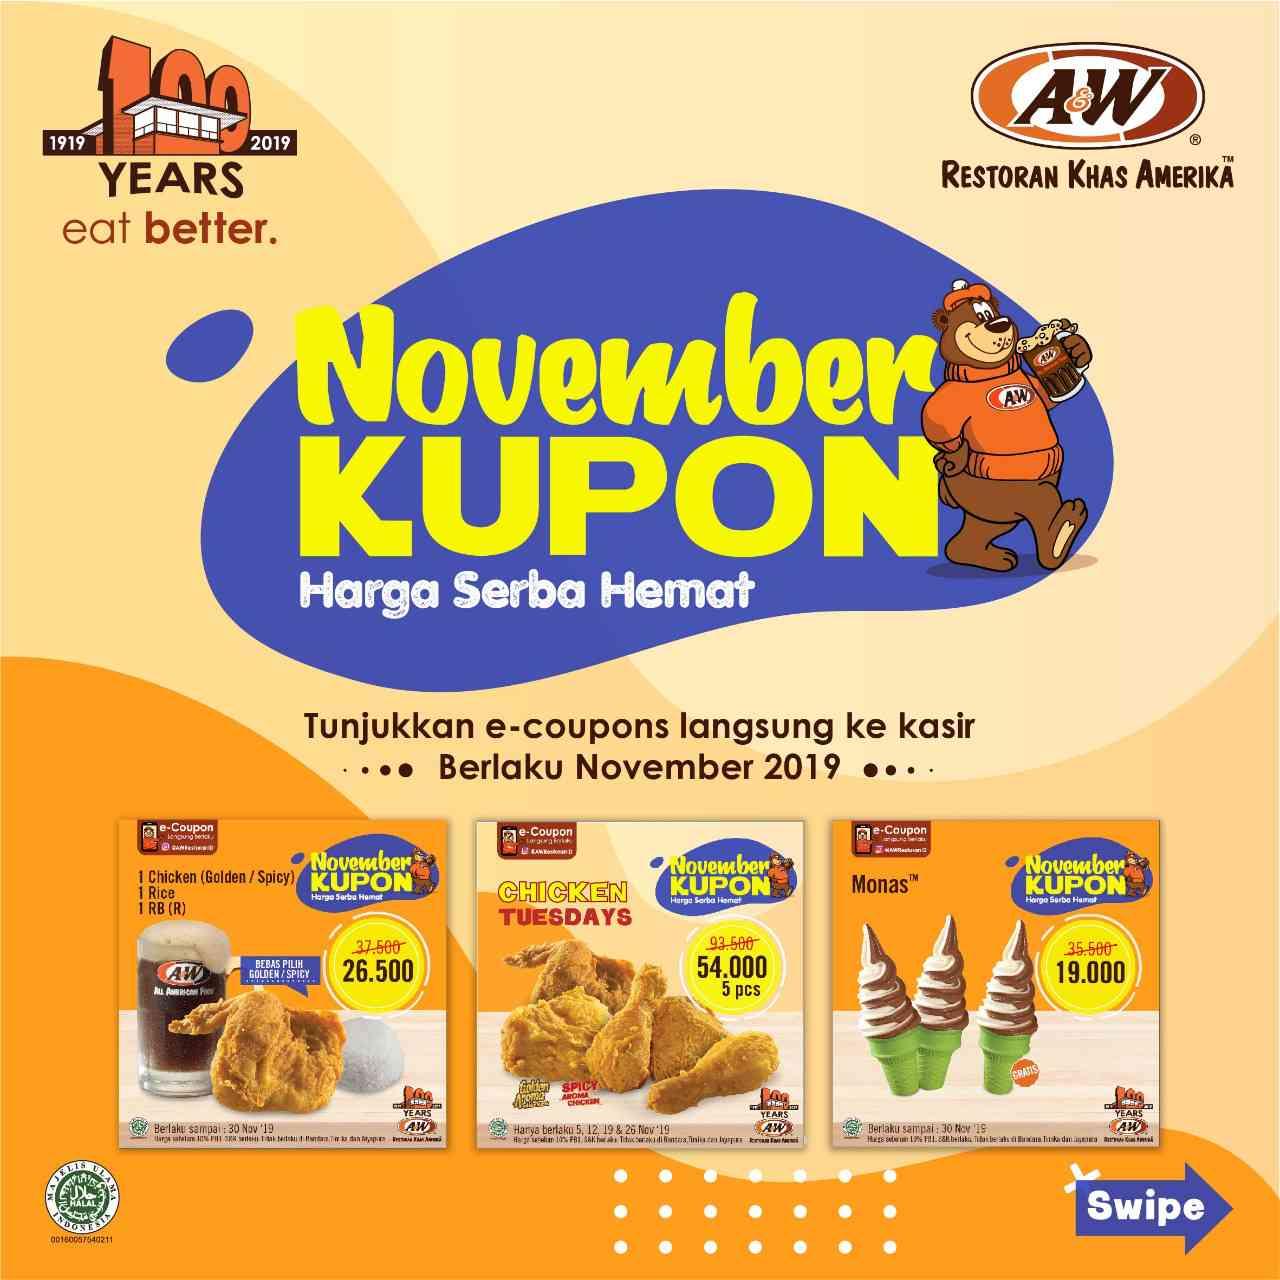 Diskon A&W Promo Kupon November Hemat